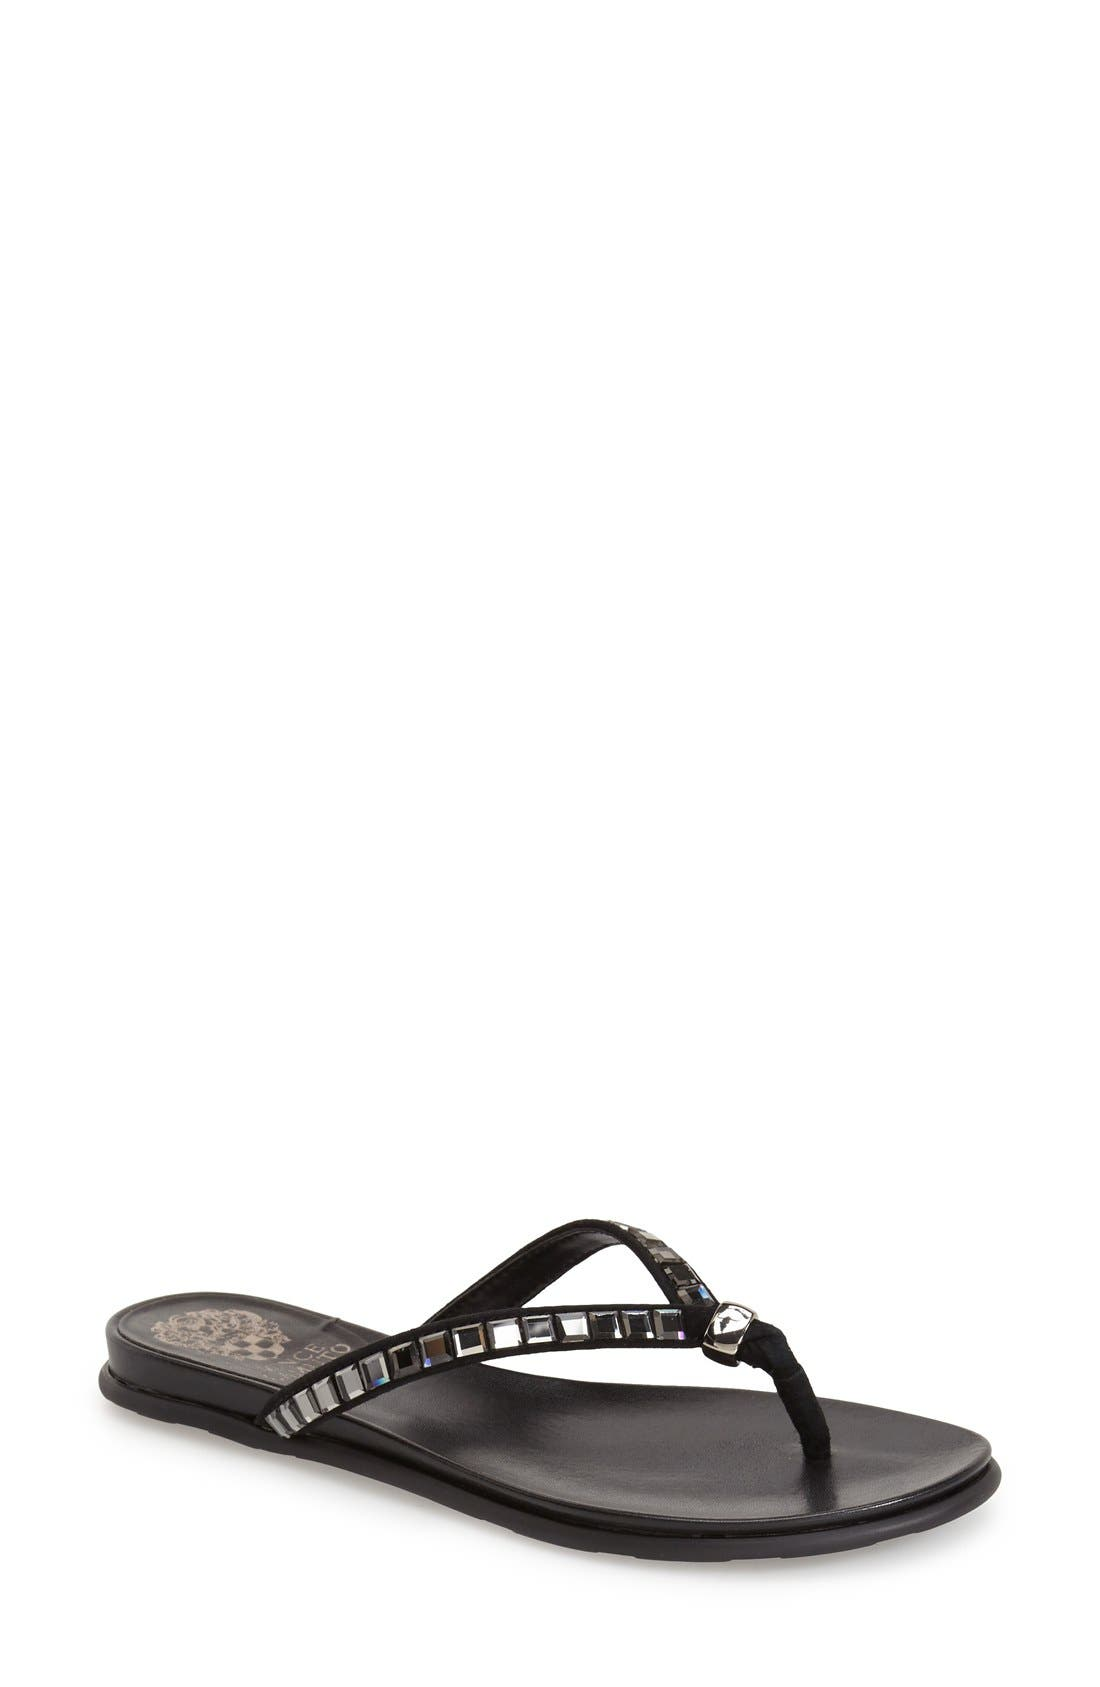 'Ellita' Flat Sandal,                         Main,                         color, Black Leather